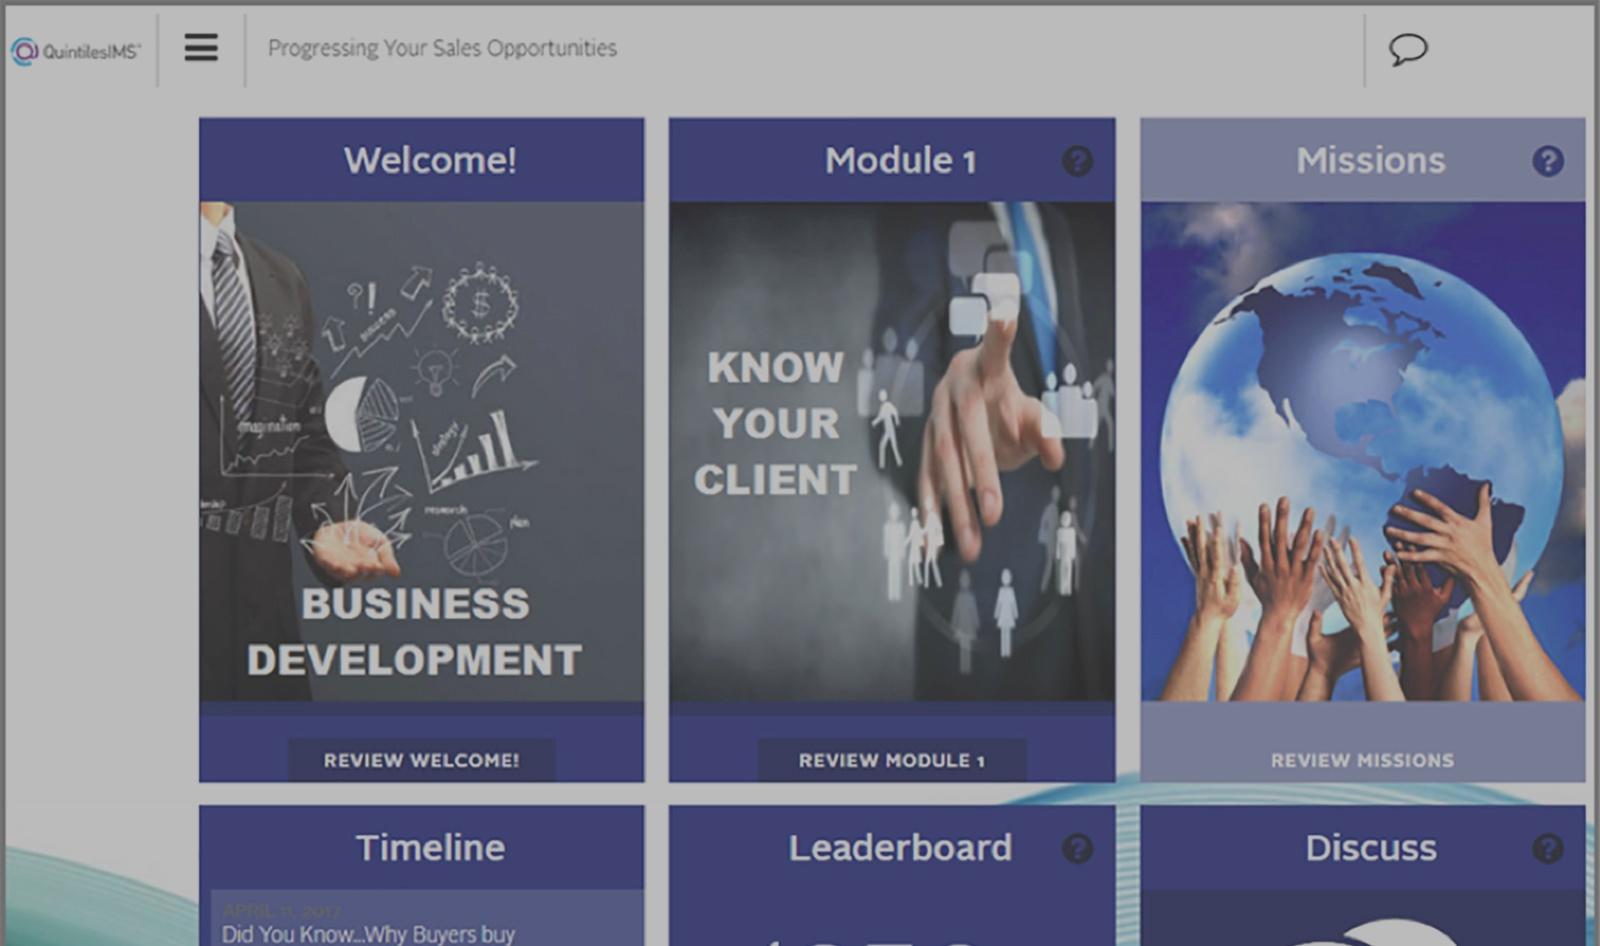 QuintilesIMS' homepage